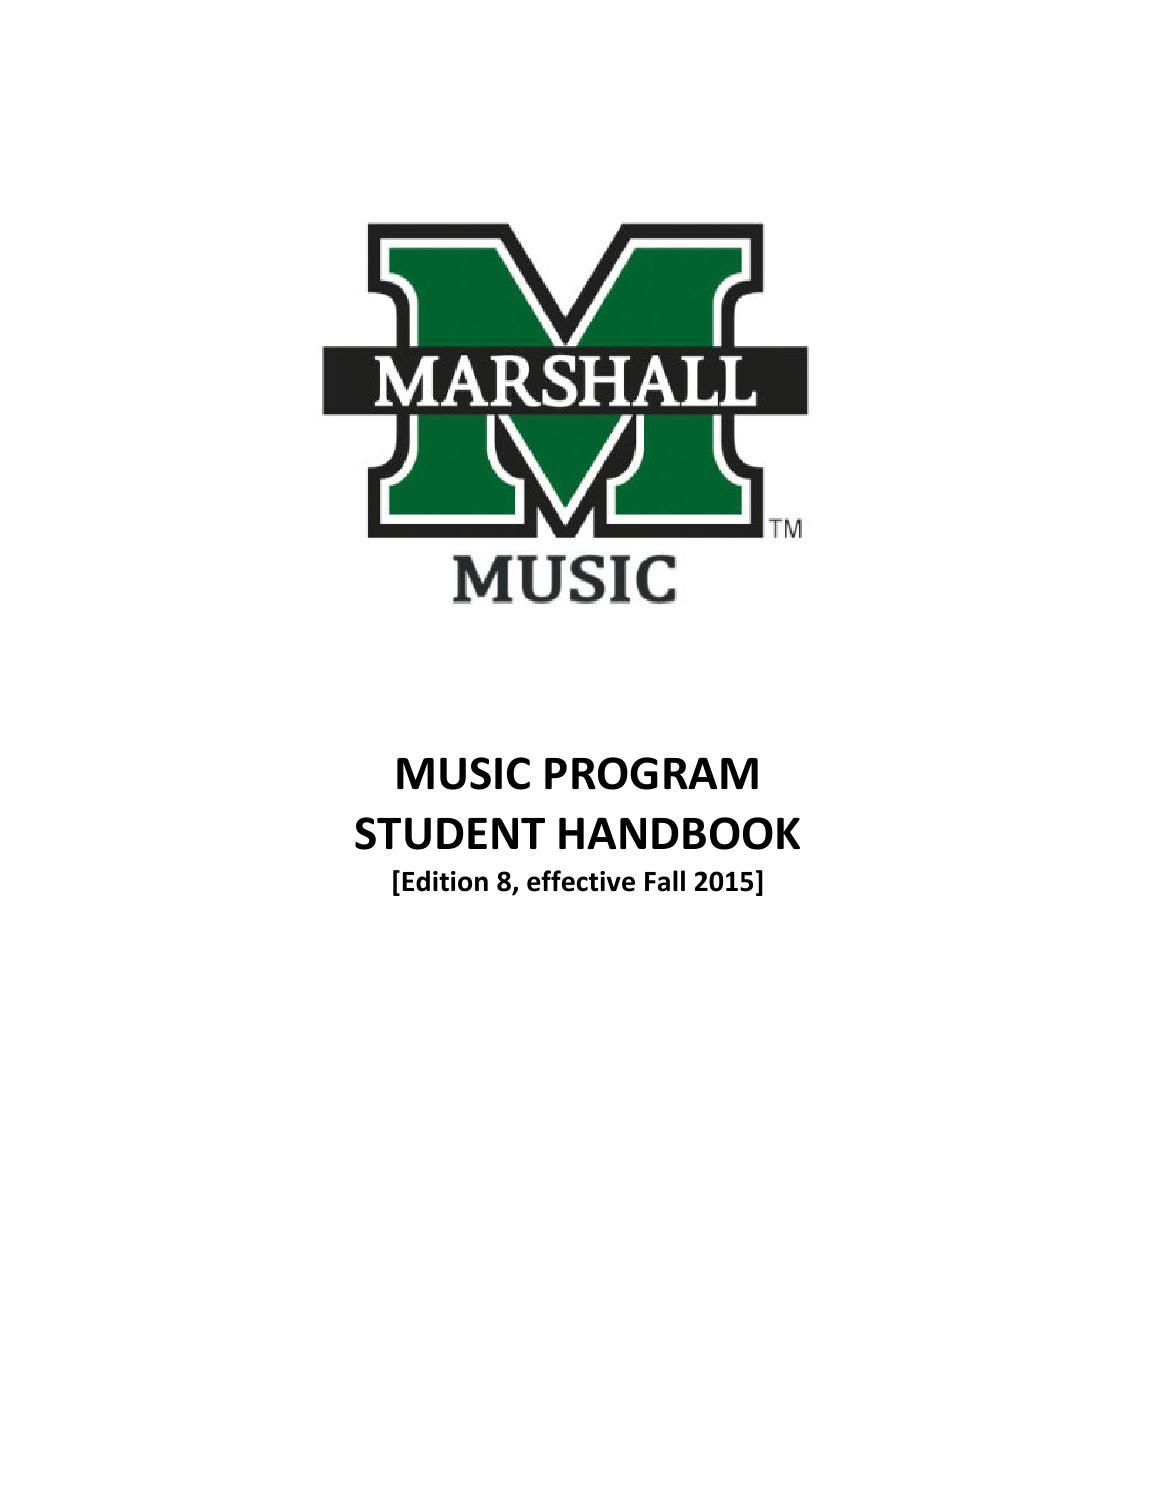 Music program handbook fall 2015 by Marshall University